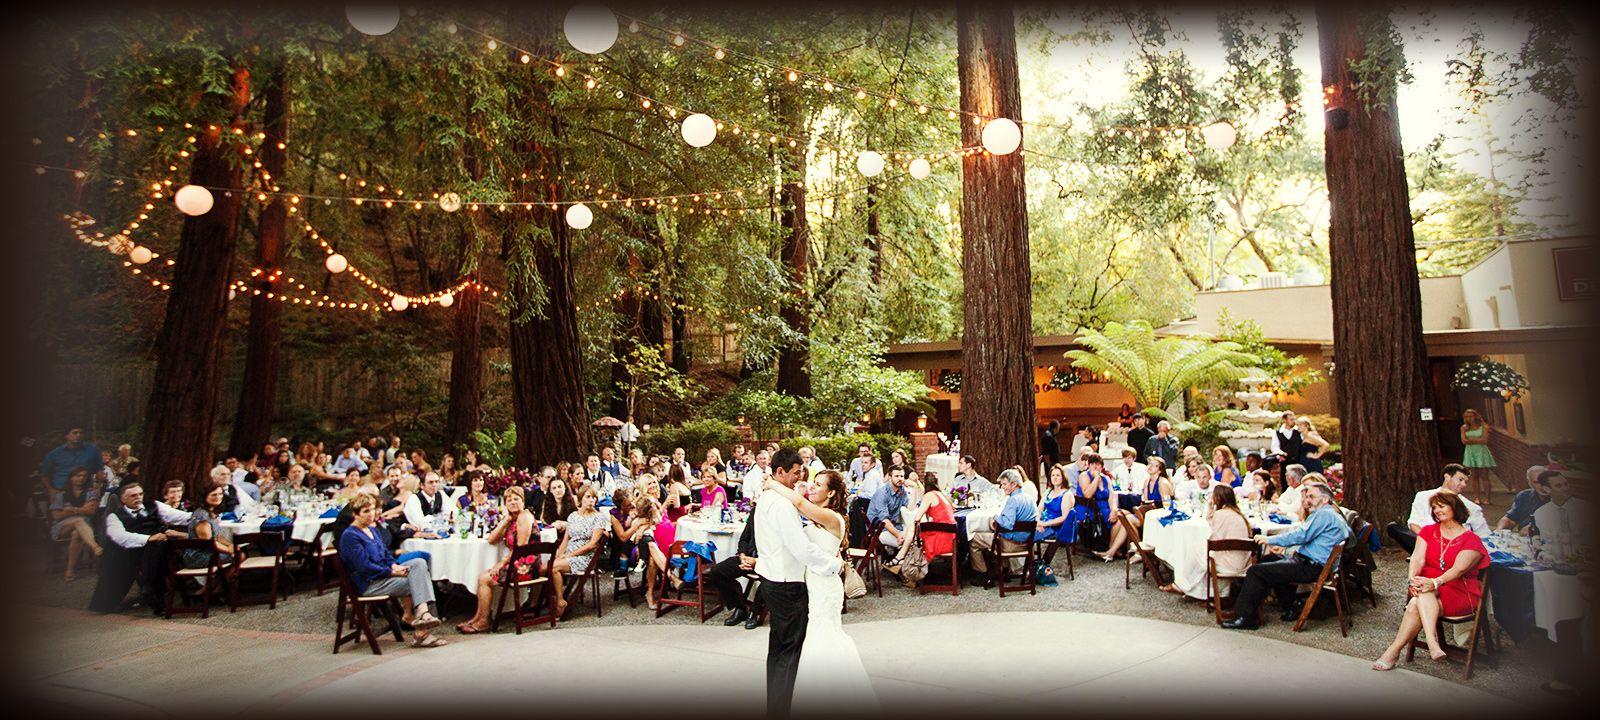 Marin County S Best Wedding Event Venue Deer Park Villa Northern California